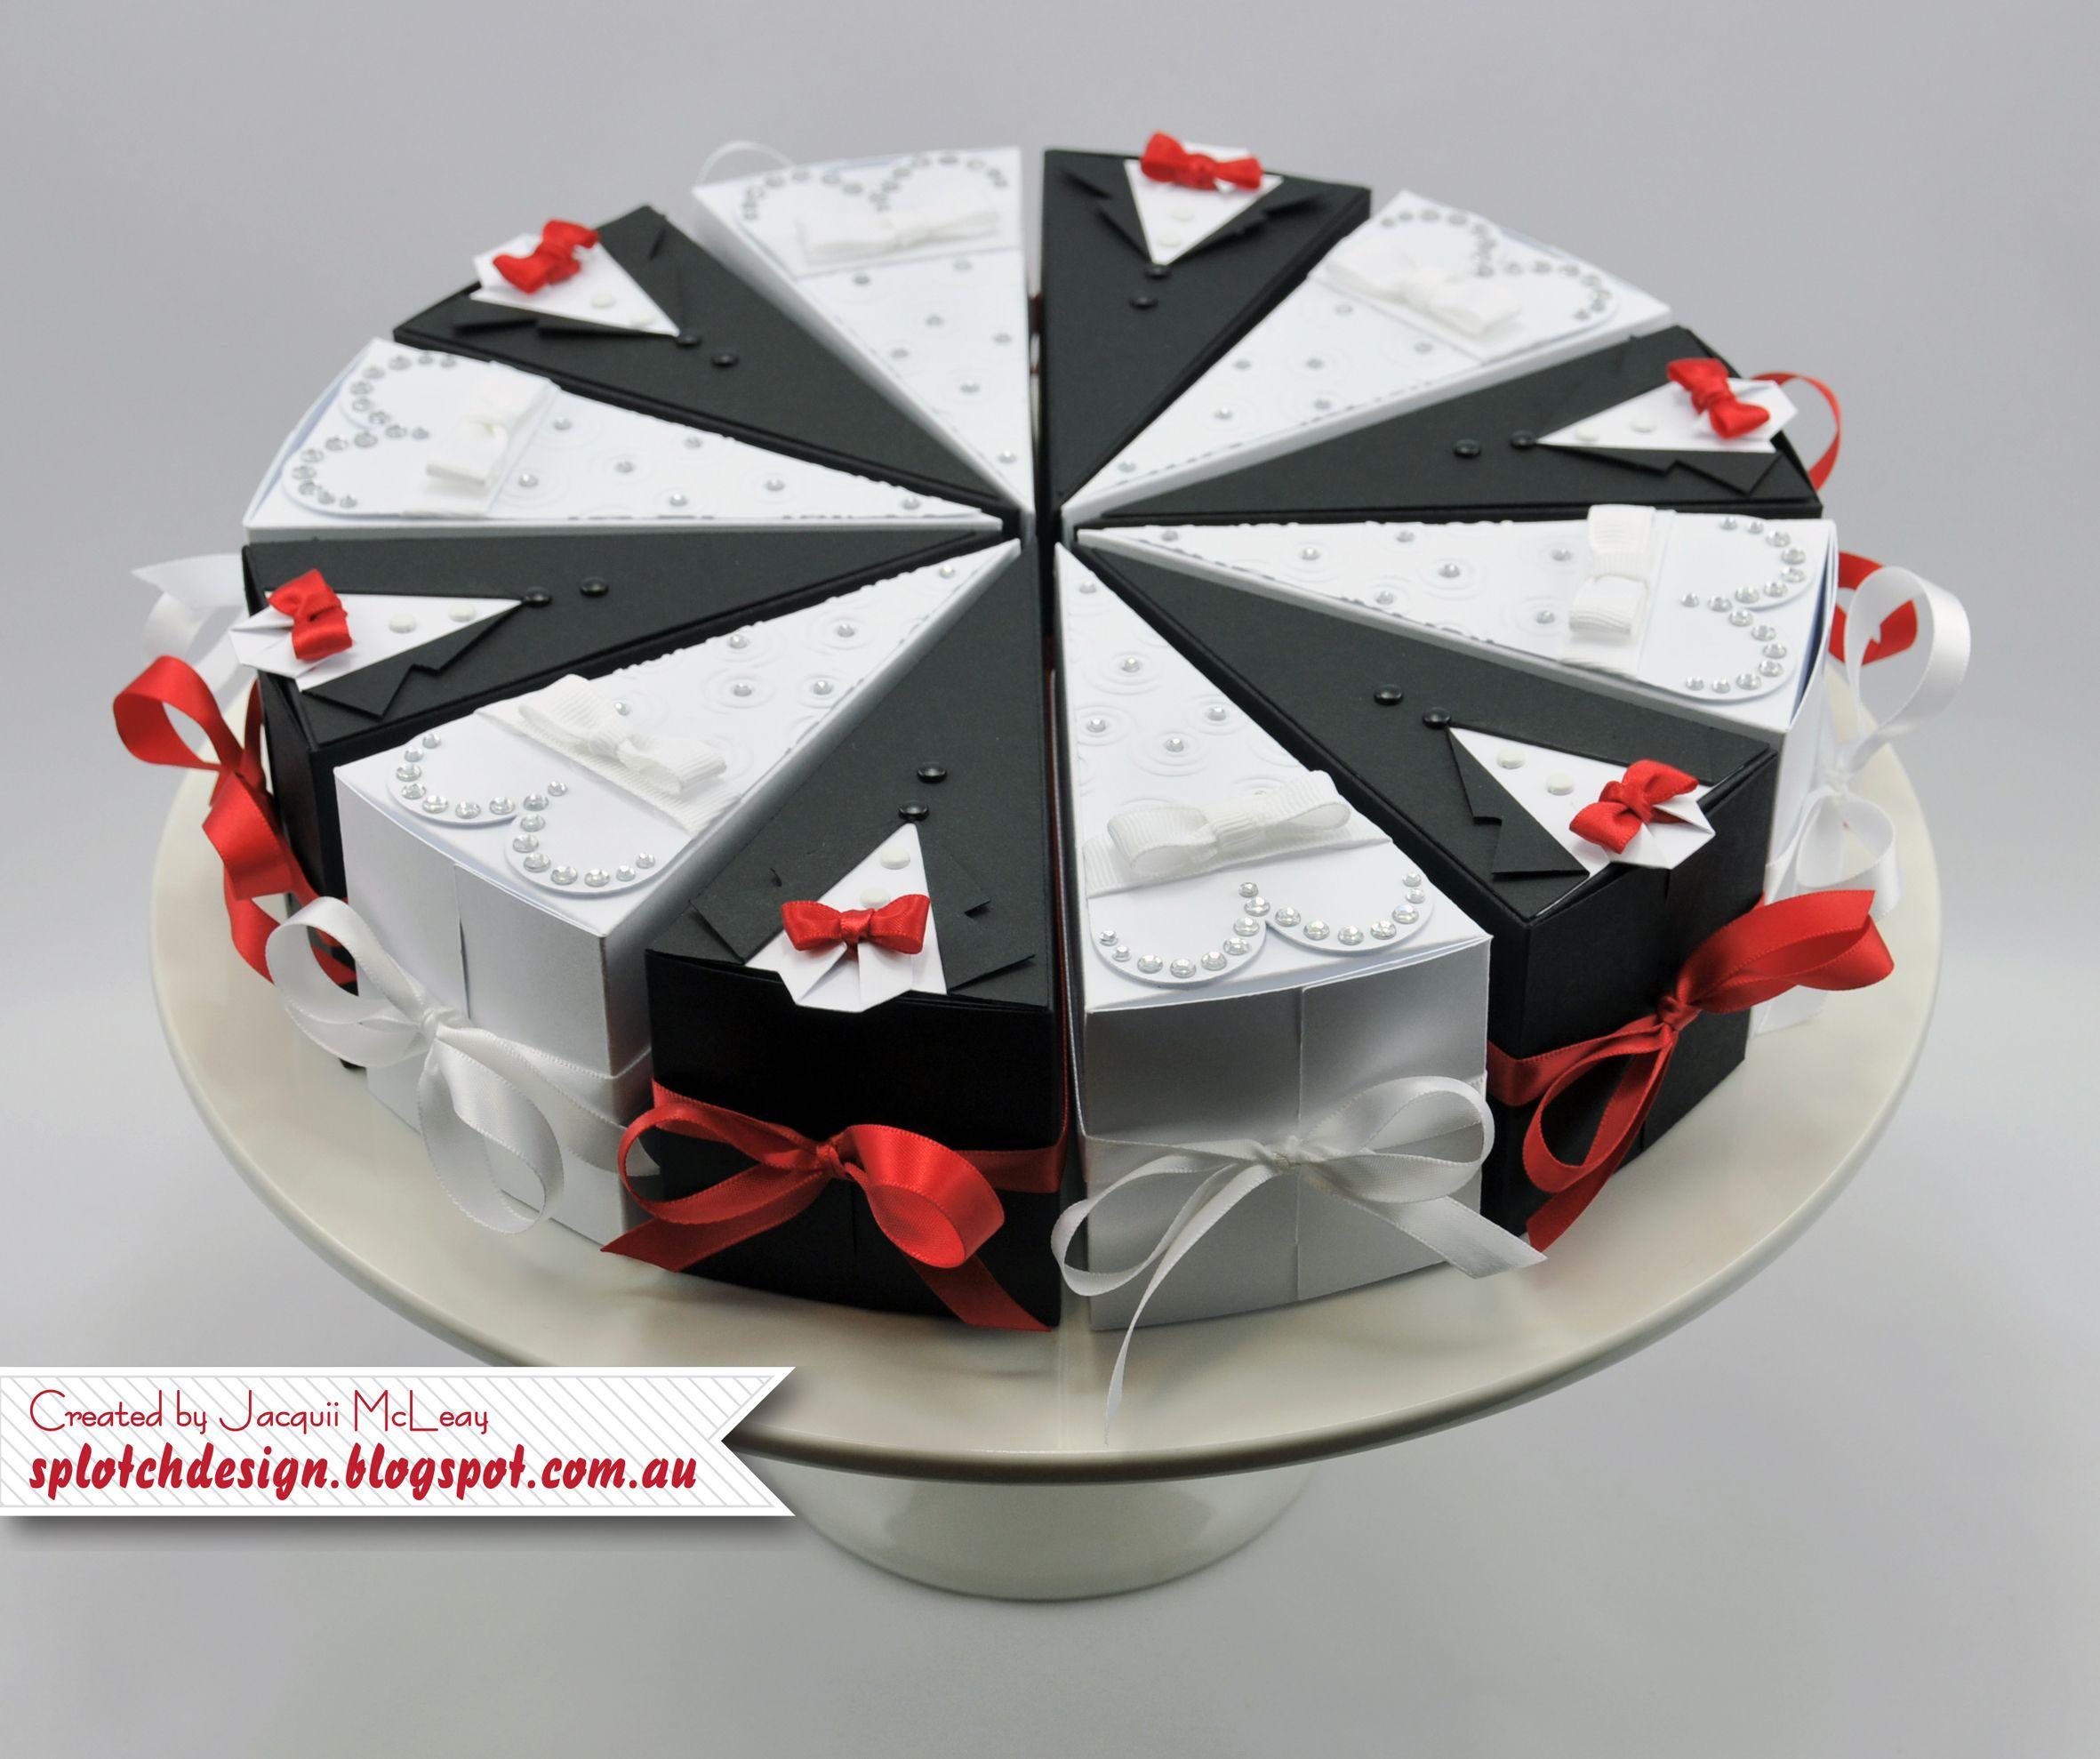 splotch design jacquii mcleay stampin up for wedding cake